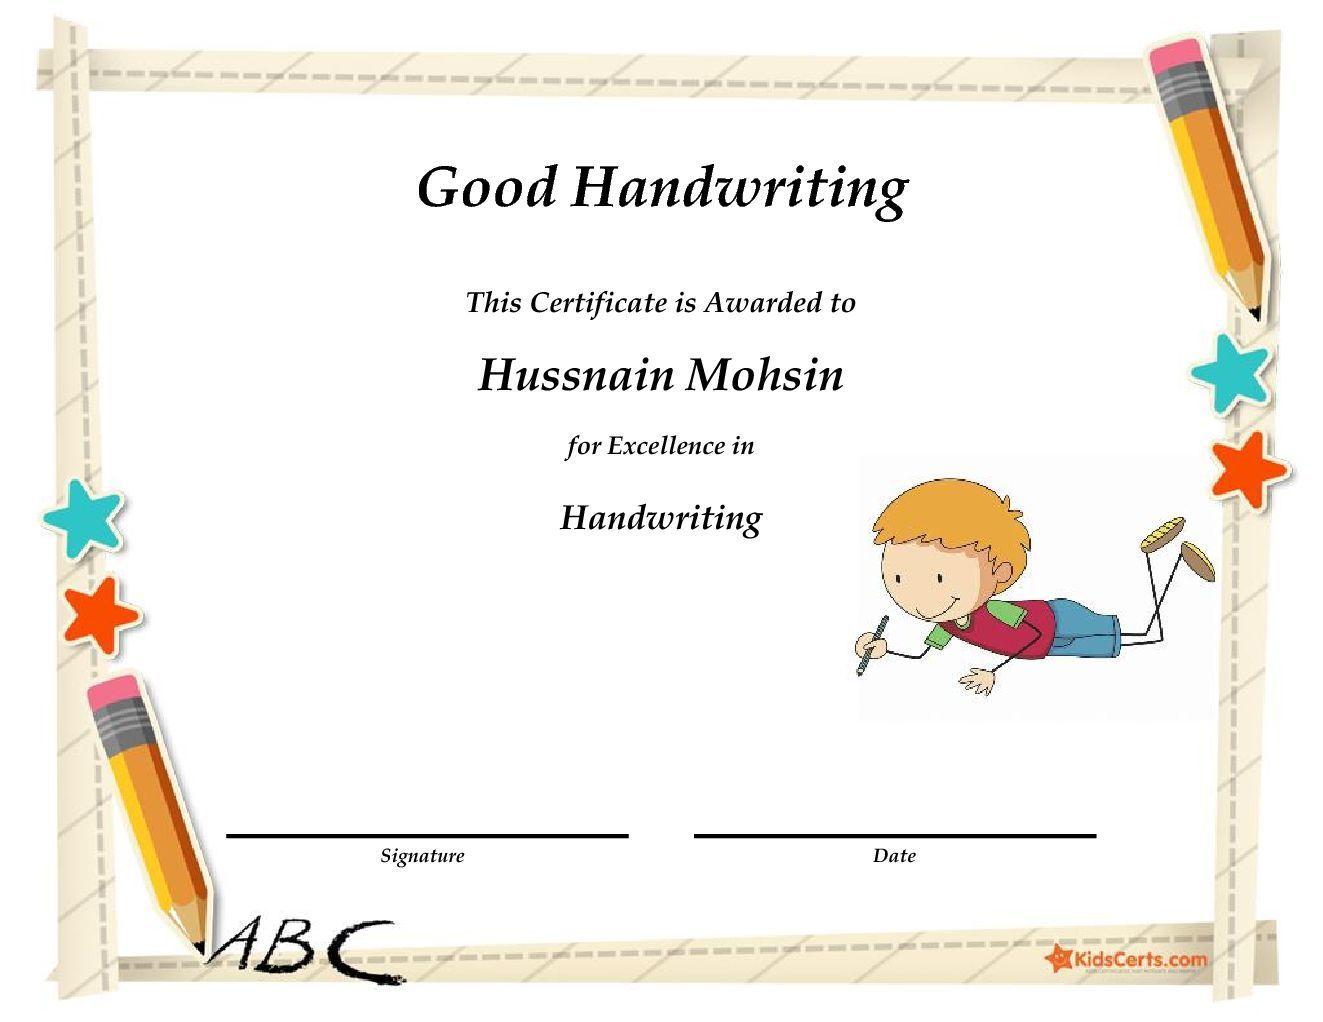 Good Handwriting